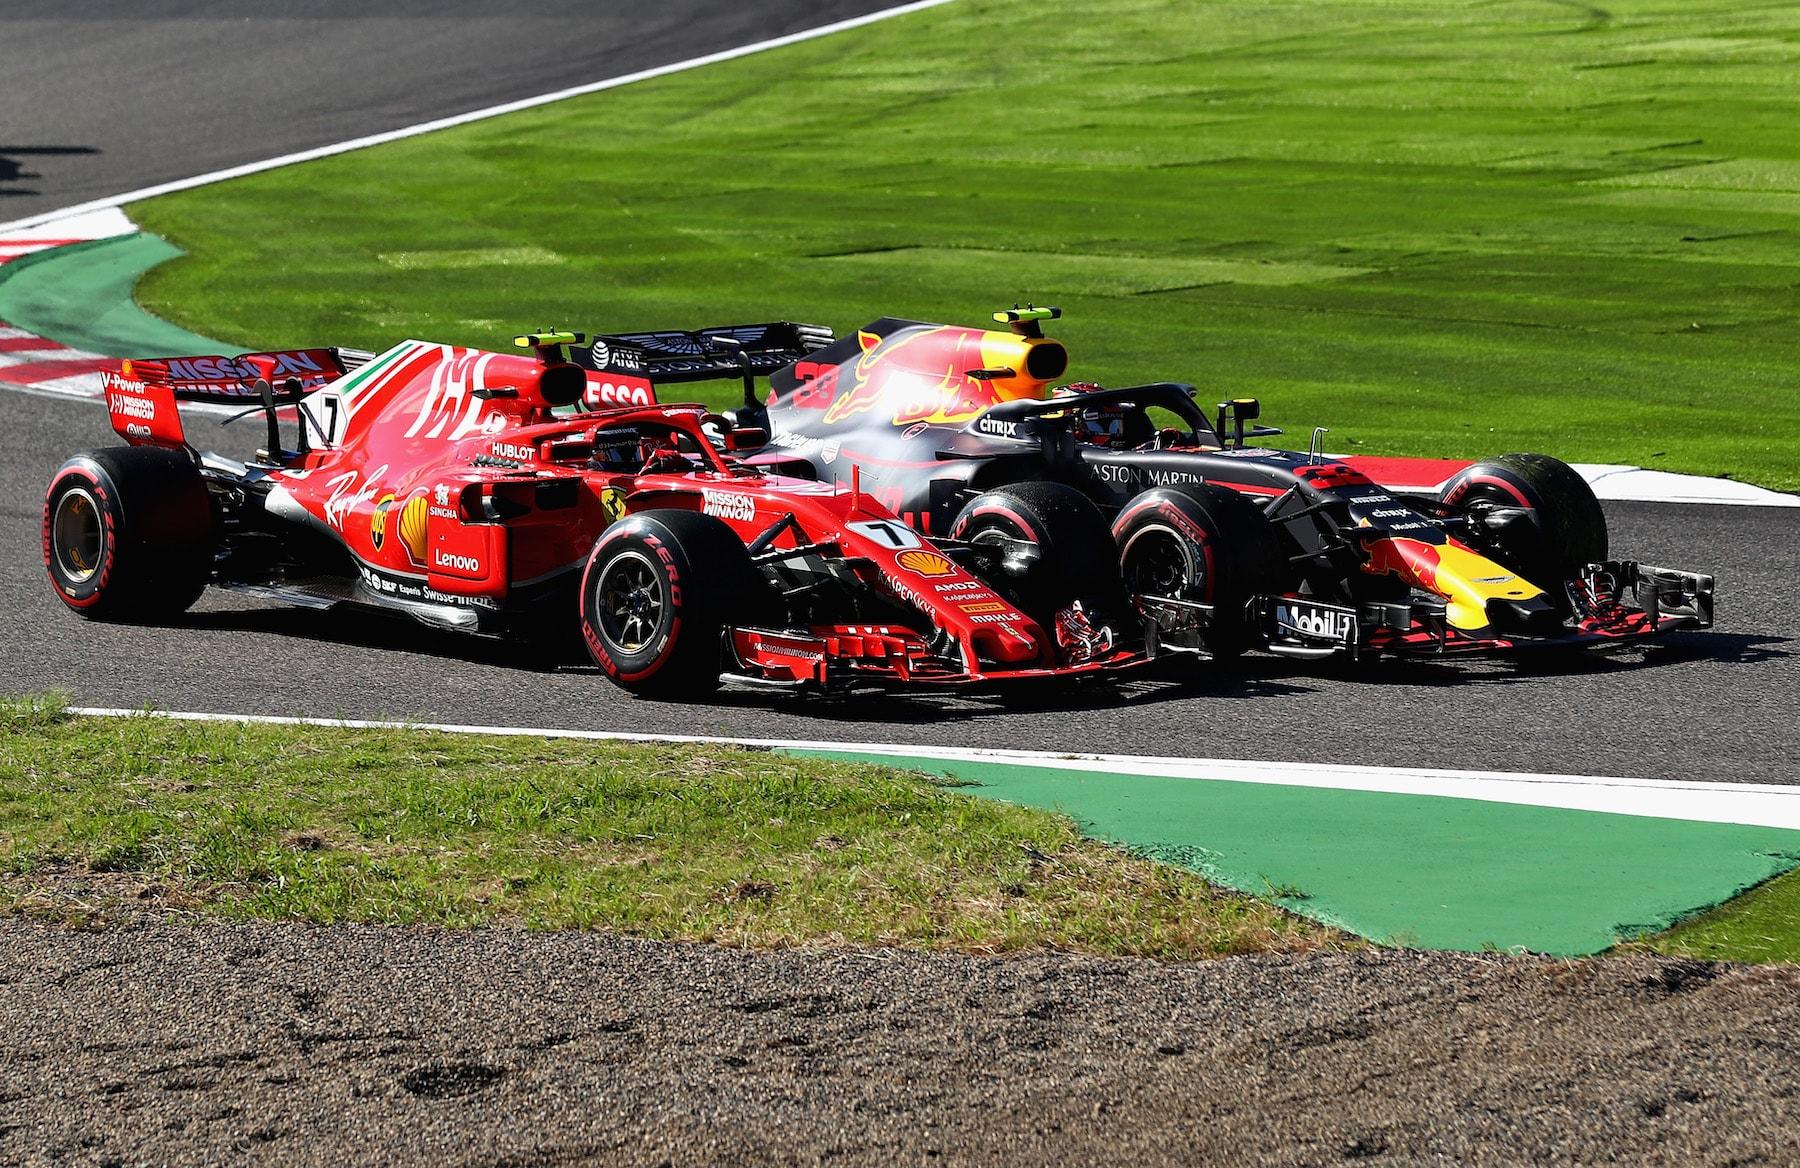 F 2018 Kimi Raikkonen and Max Verstappen | 2018 Japanese GP 1 copy.jpg